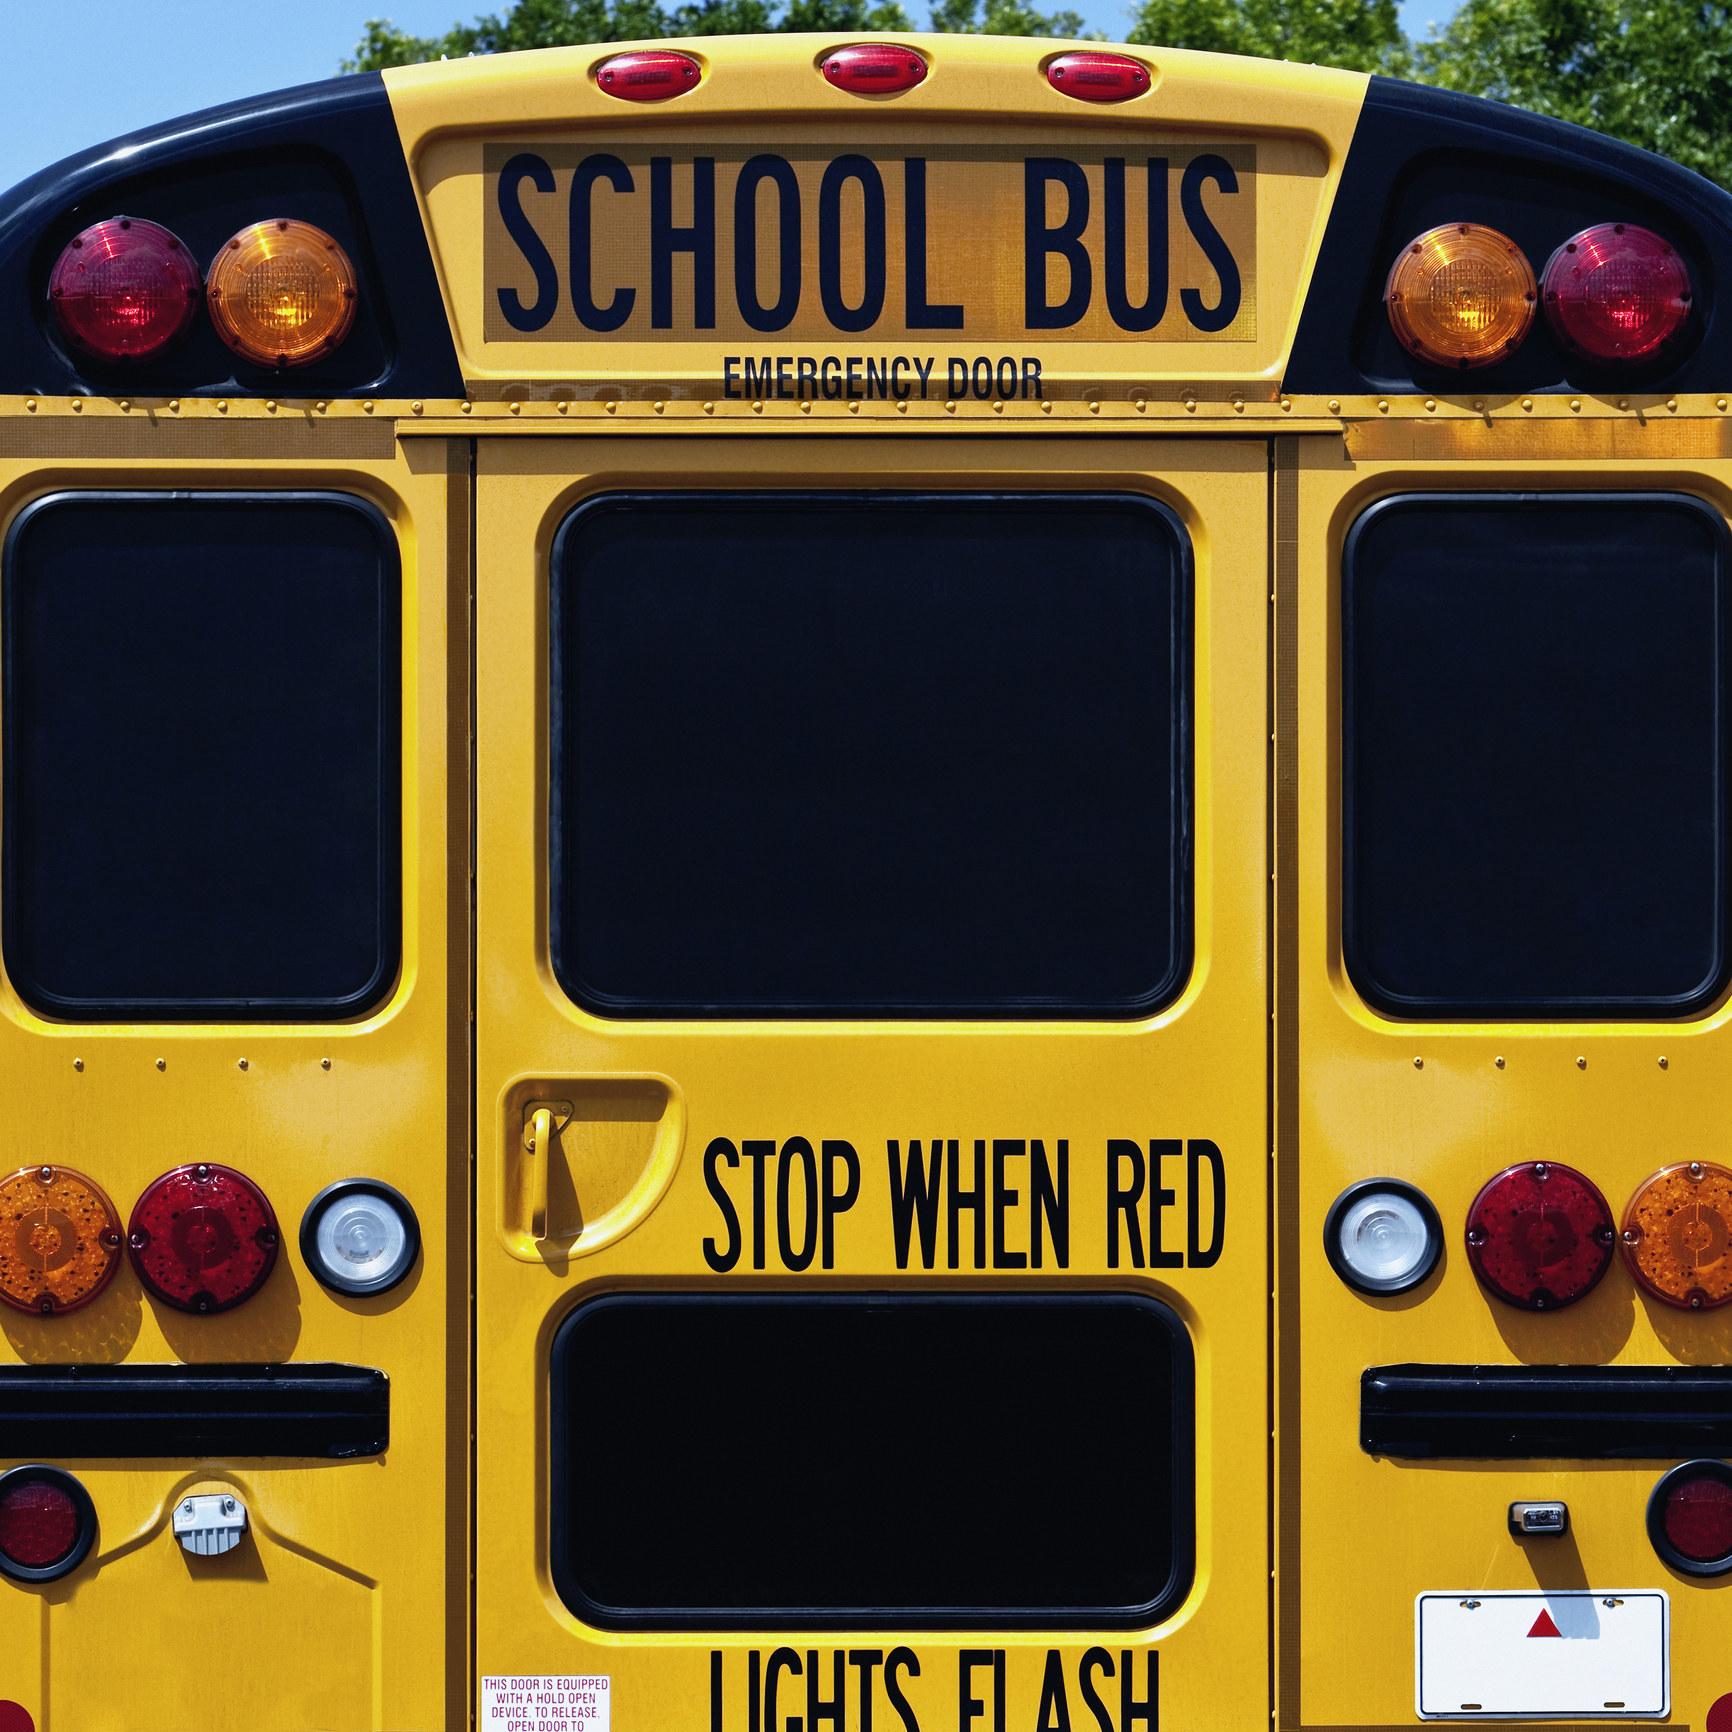 A yellow school bus.